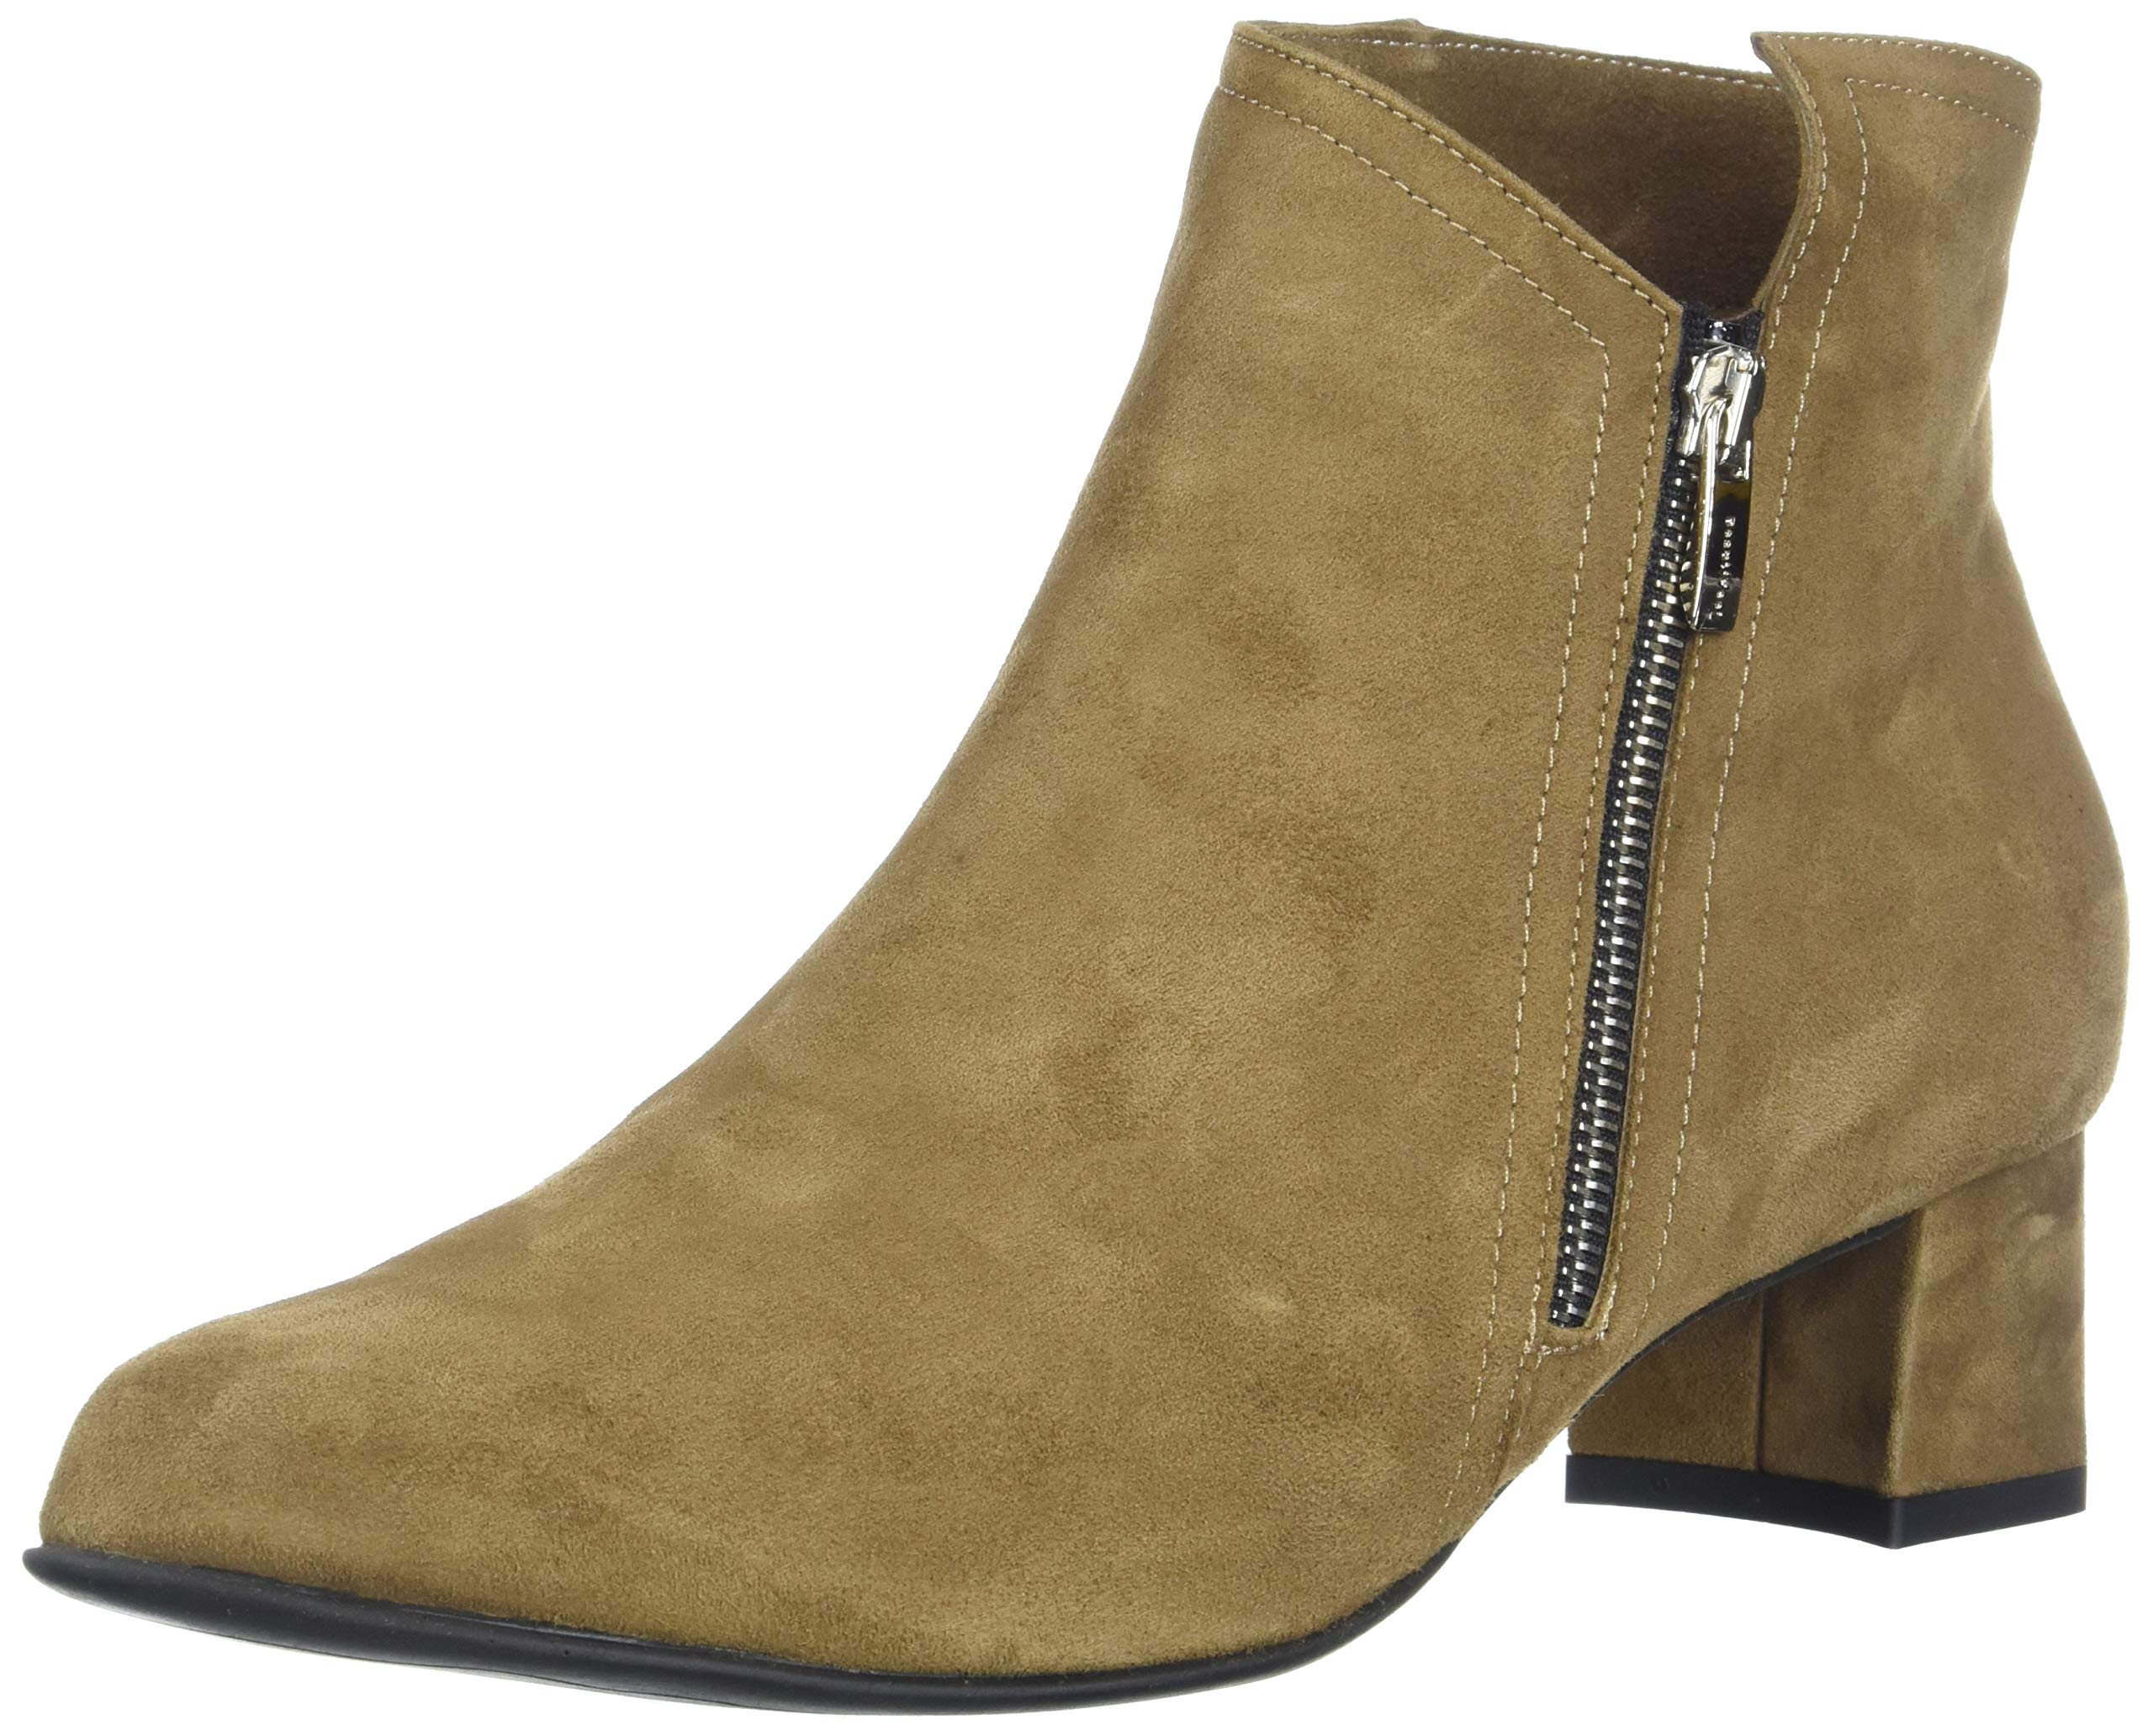 BeautiFeel Women's Alexa Fashion Boot, Cuoio Suede, 410 Medium EU (10 US) by BeautiFeel